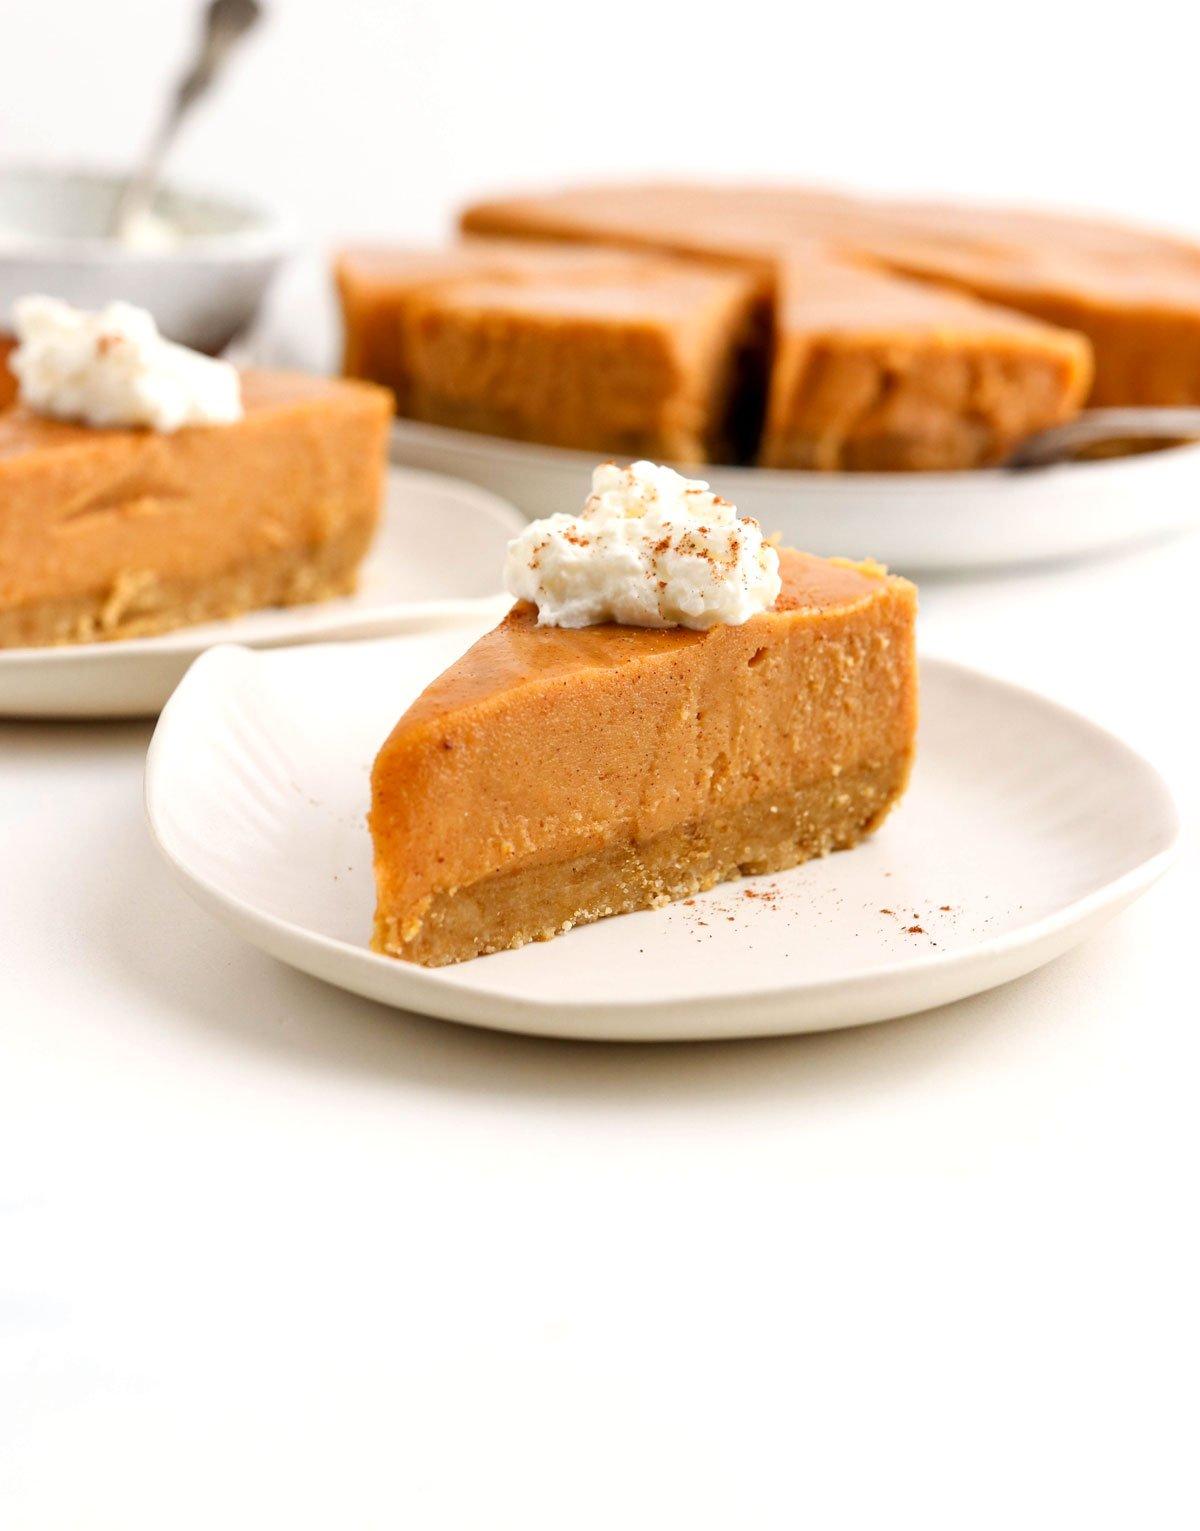 slice of vegan pumpkin cheesecake on plate